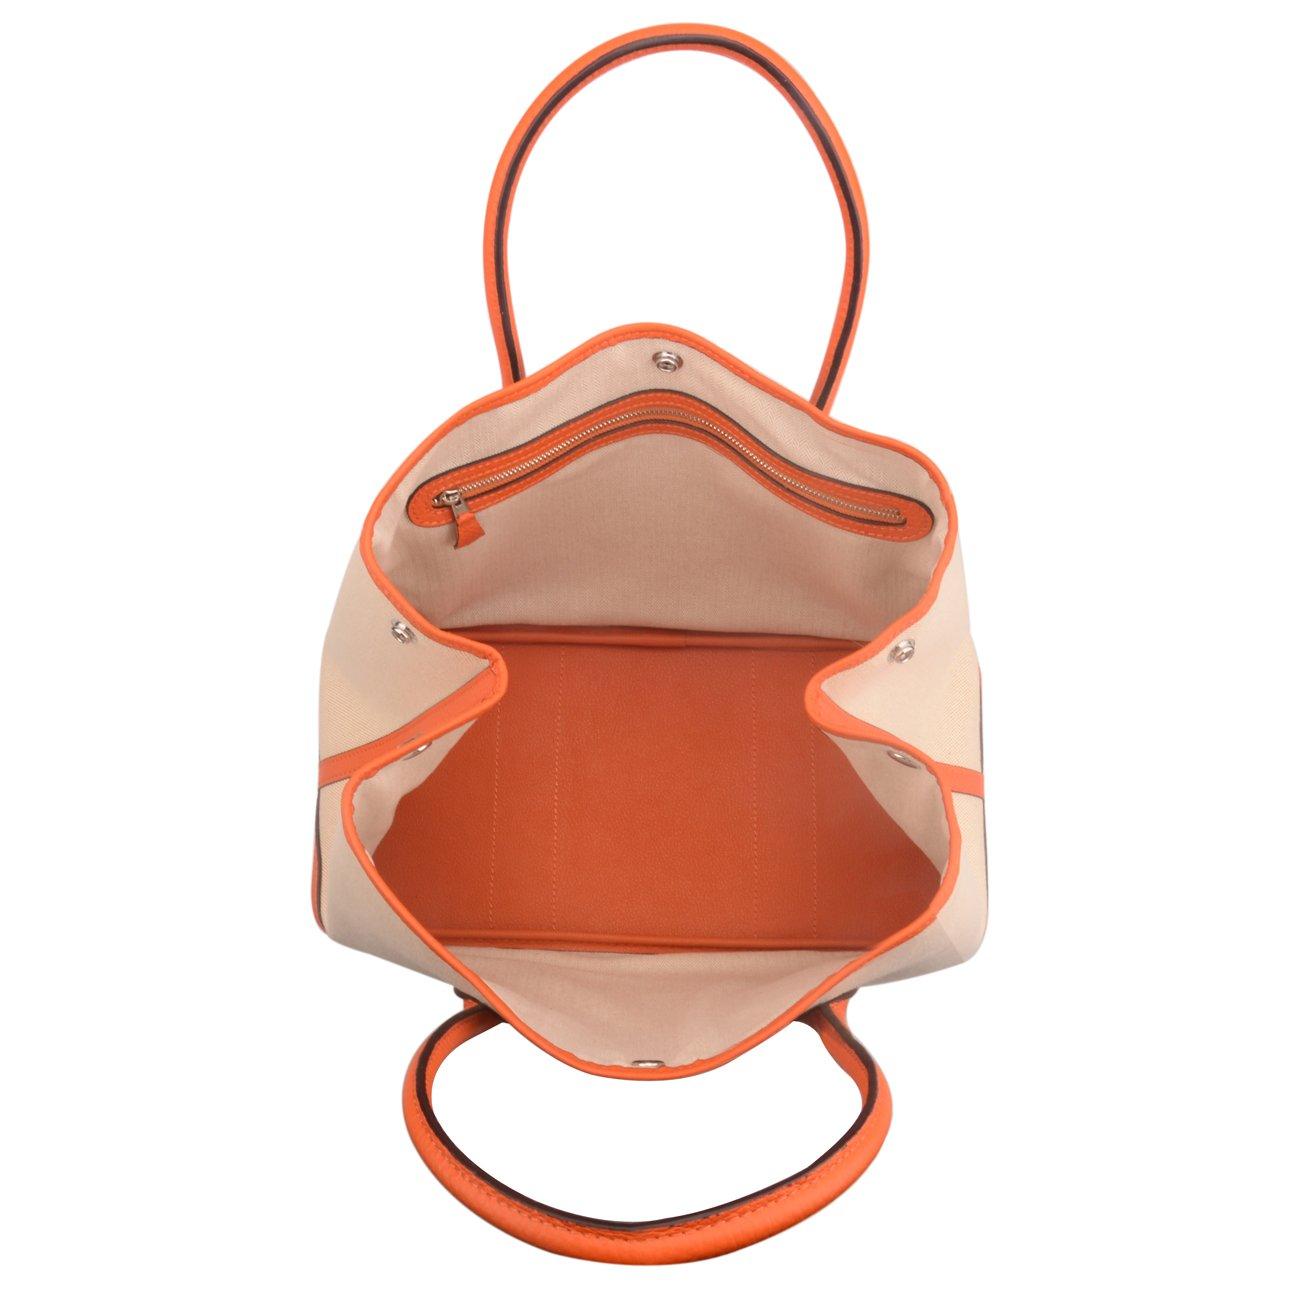 Ainifeel Women's Genuine Leather Top Handle Handbag Shopping Bag Tote Bag (Orange(leather+canvas)) by Ainifeel (Image #6)